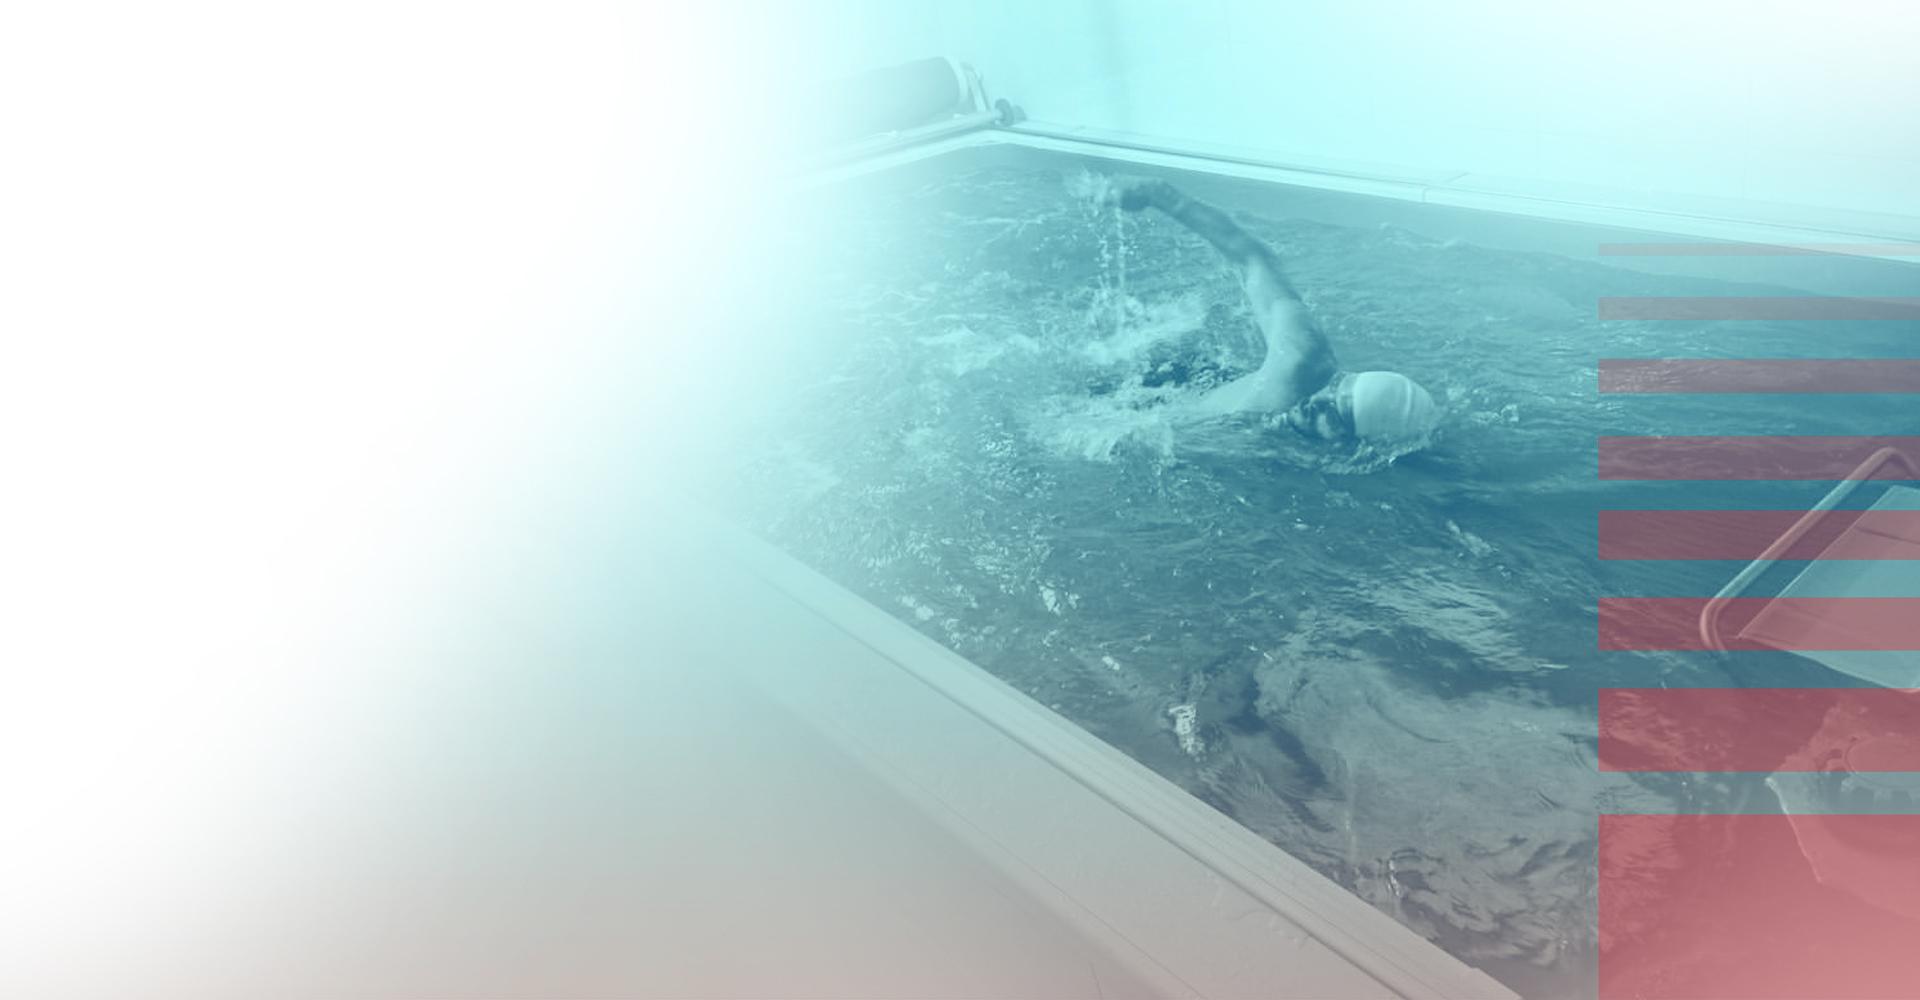 piscine enlesspool, courant continu, natation, coach chris